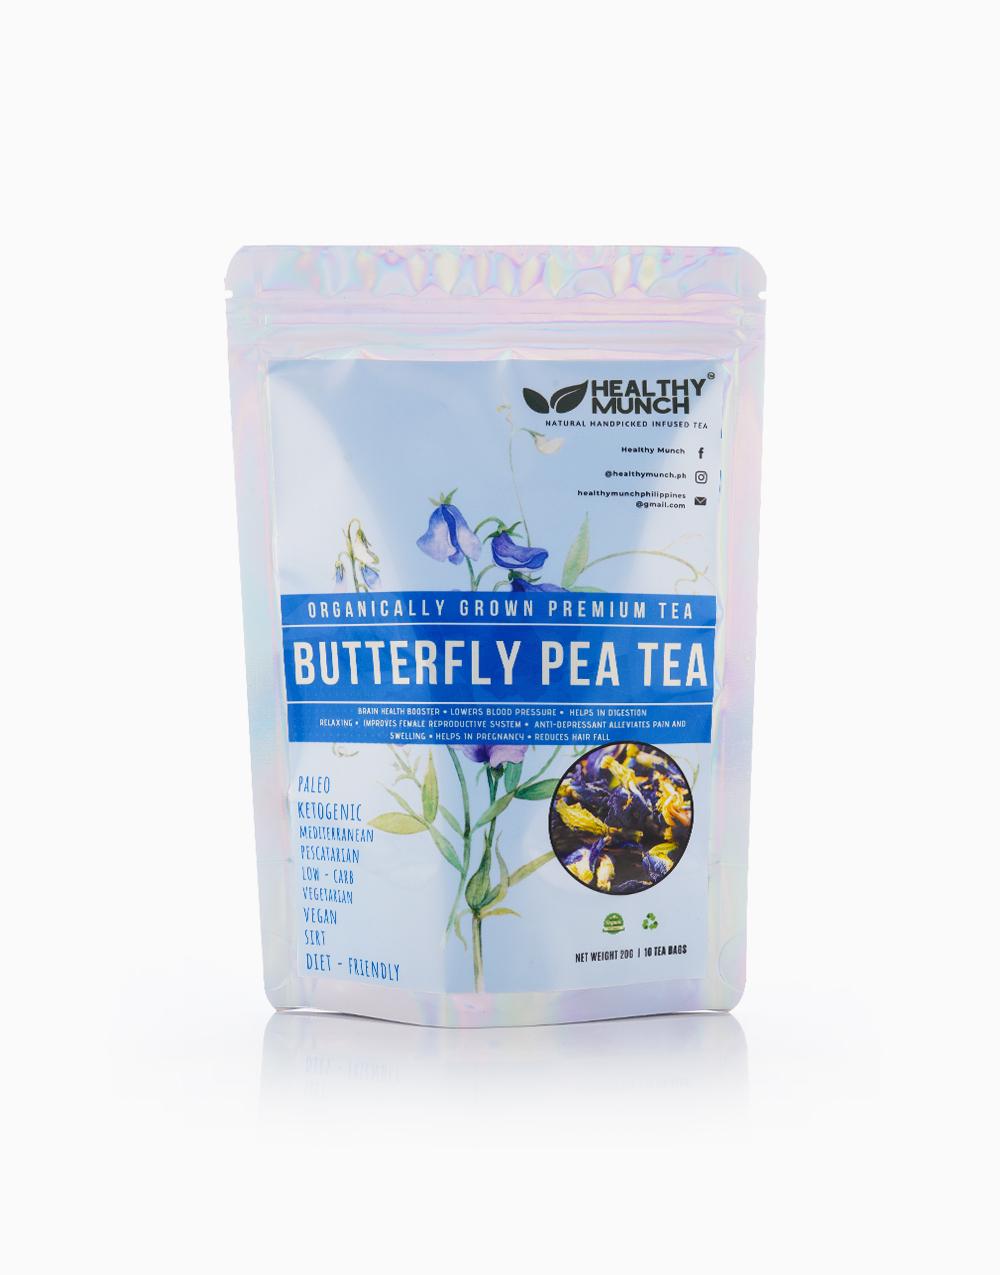 Butterfly Pea Tea (20g) by Healthy Munch